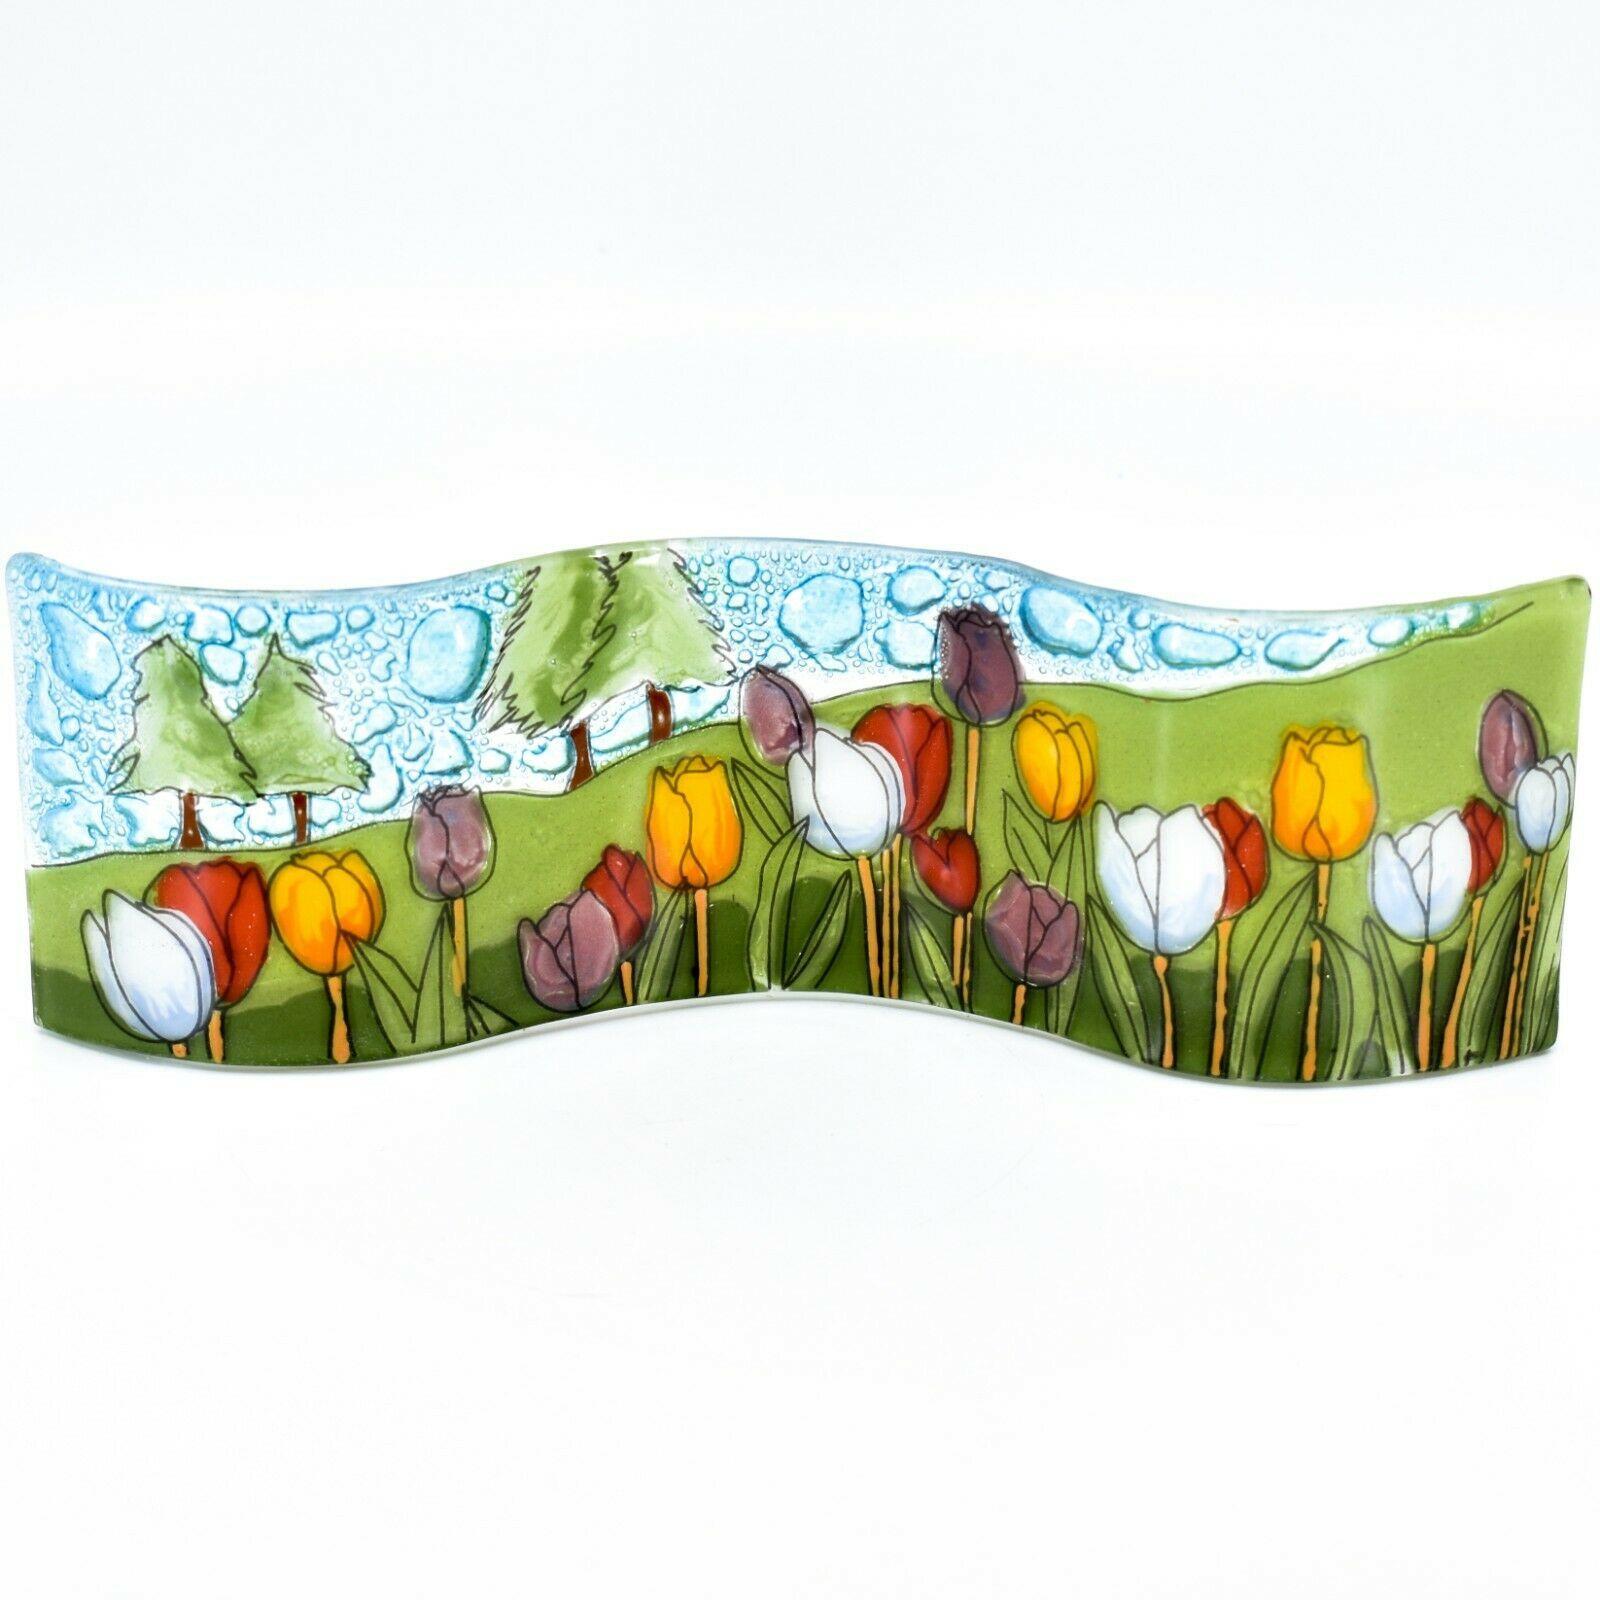 Fused Art Glass Tulips Flower Field Wavy Decor Sun Catcher Handmade in Ecuador